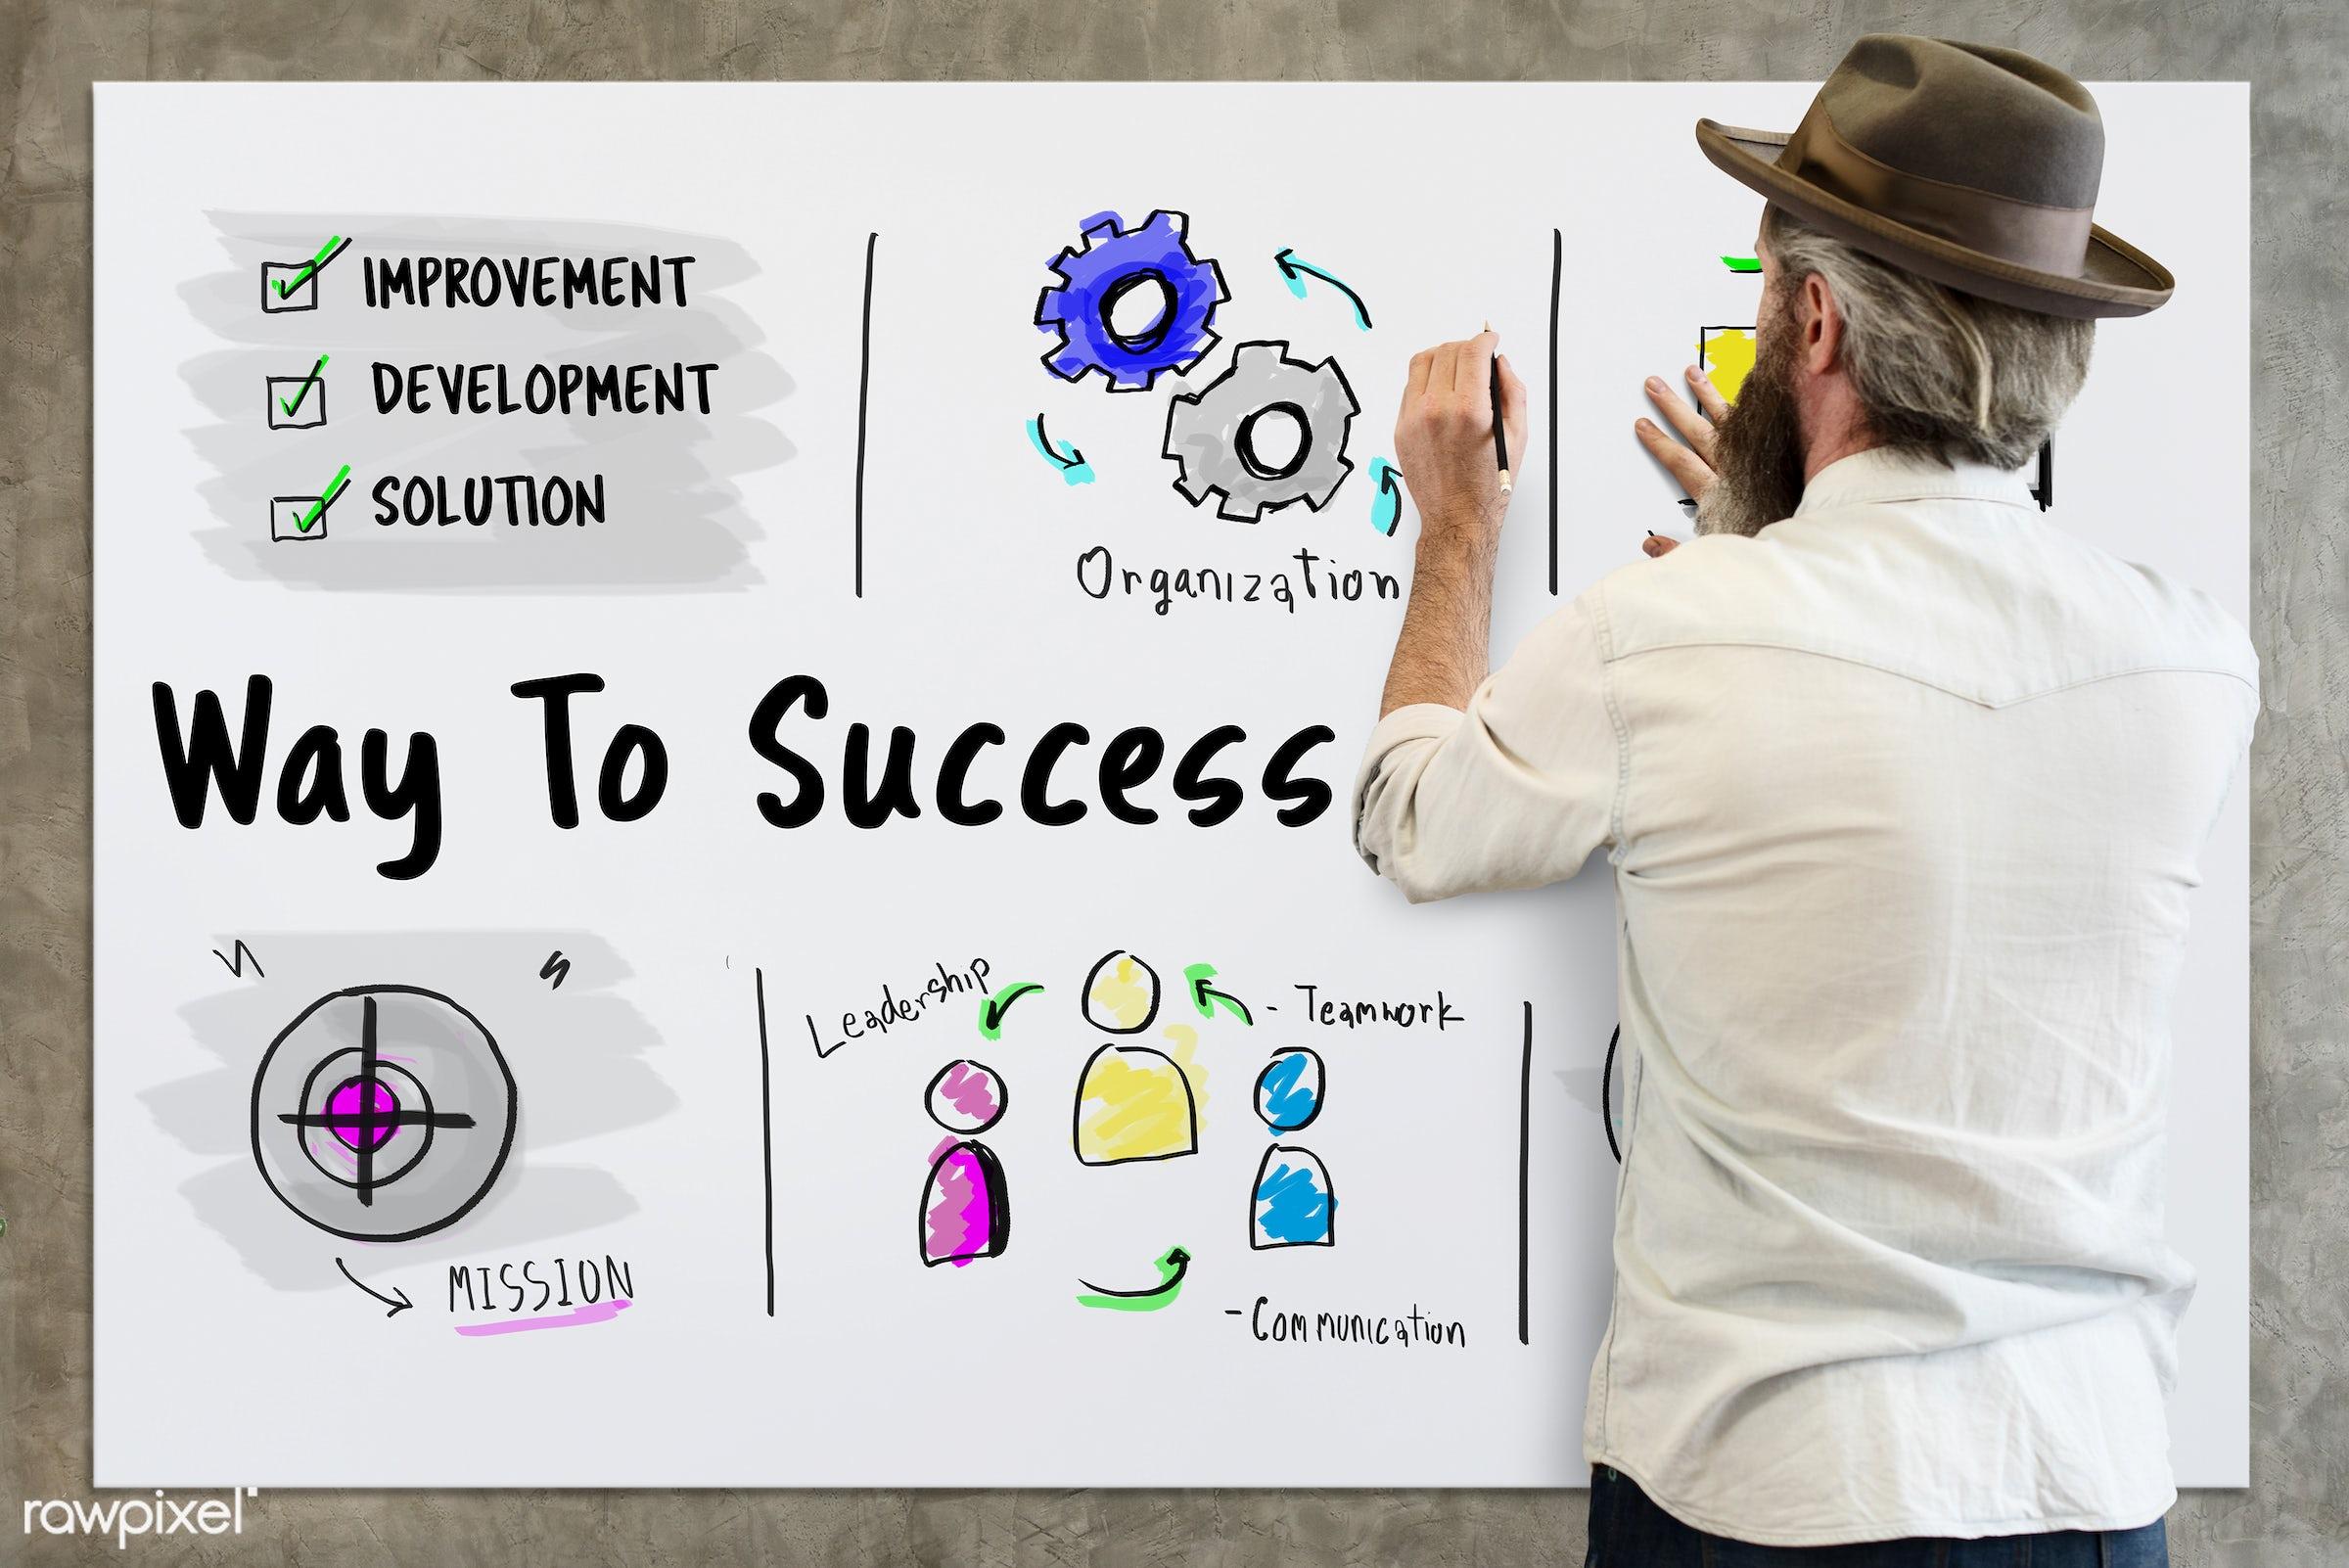 achievement, adult, alone, back, be creative, beard, beard guy, board, brainstorm, business, carefree, casual, chart, chill...